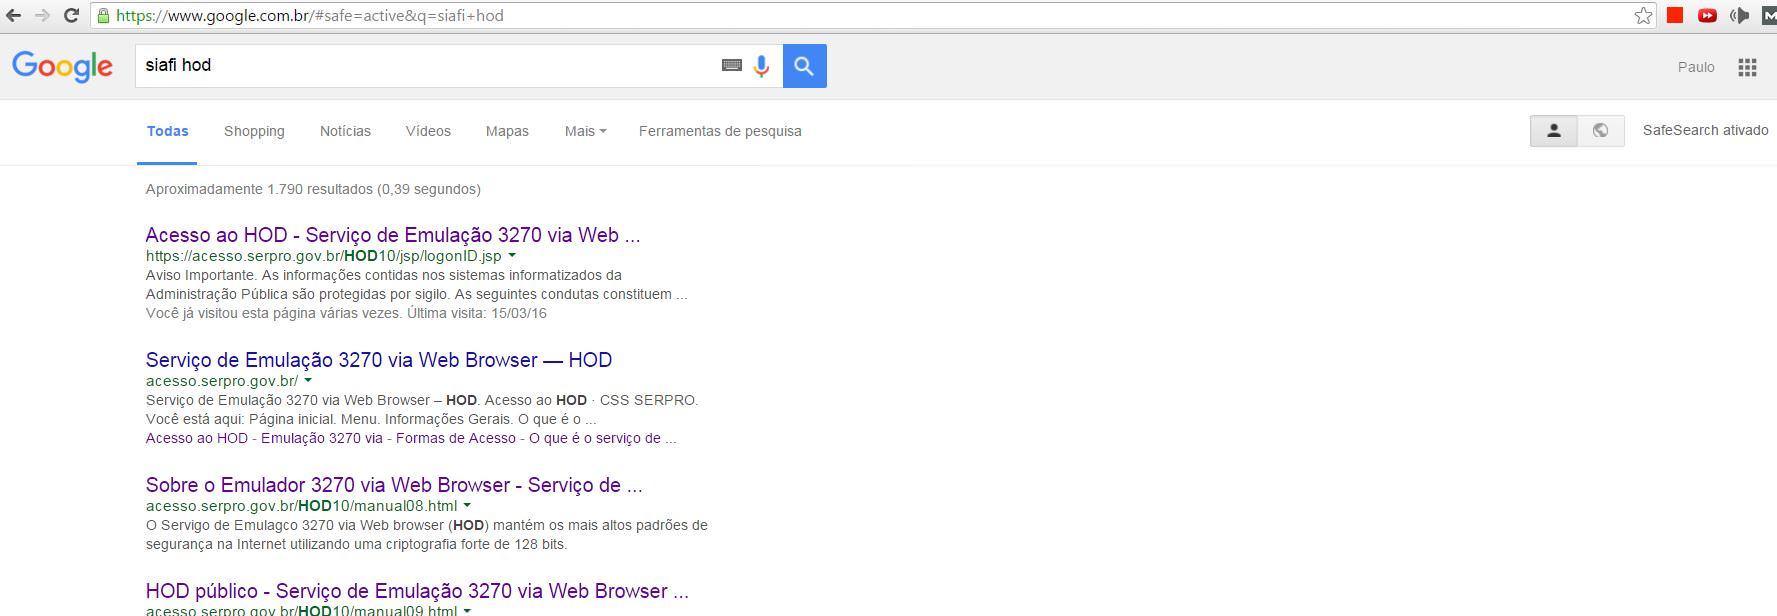 google siafi